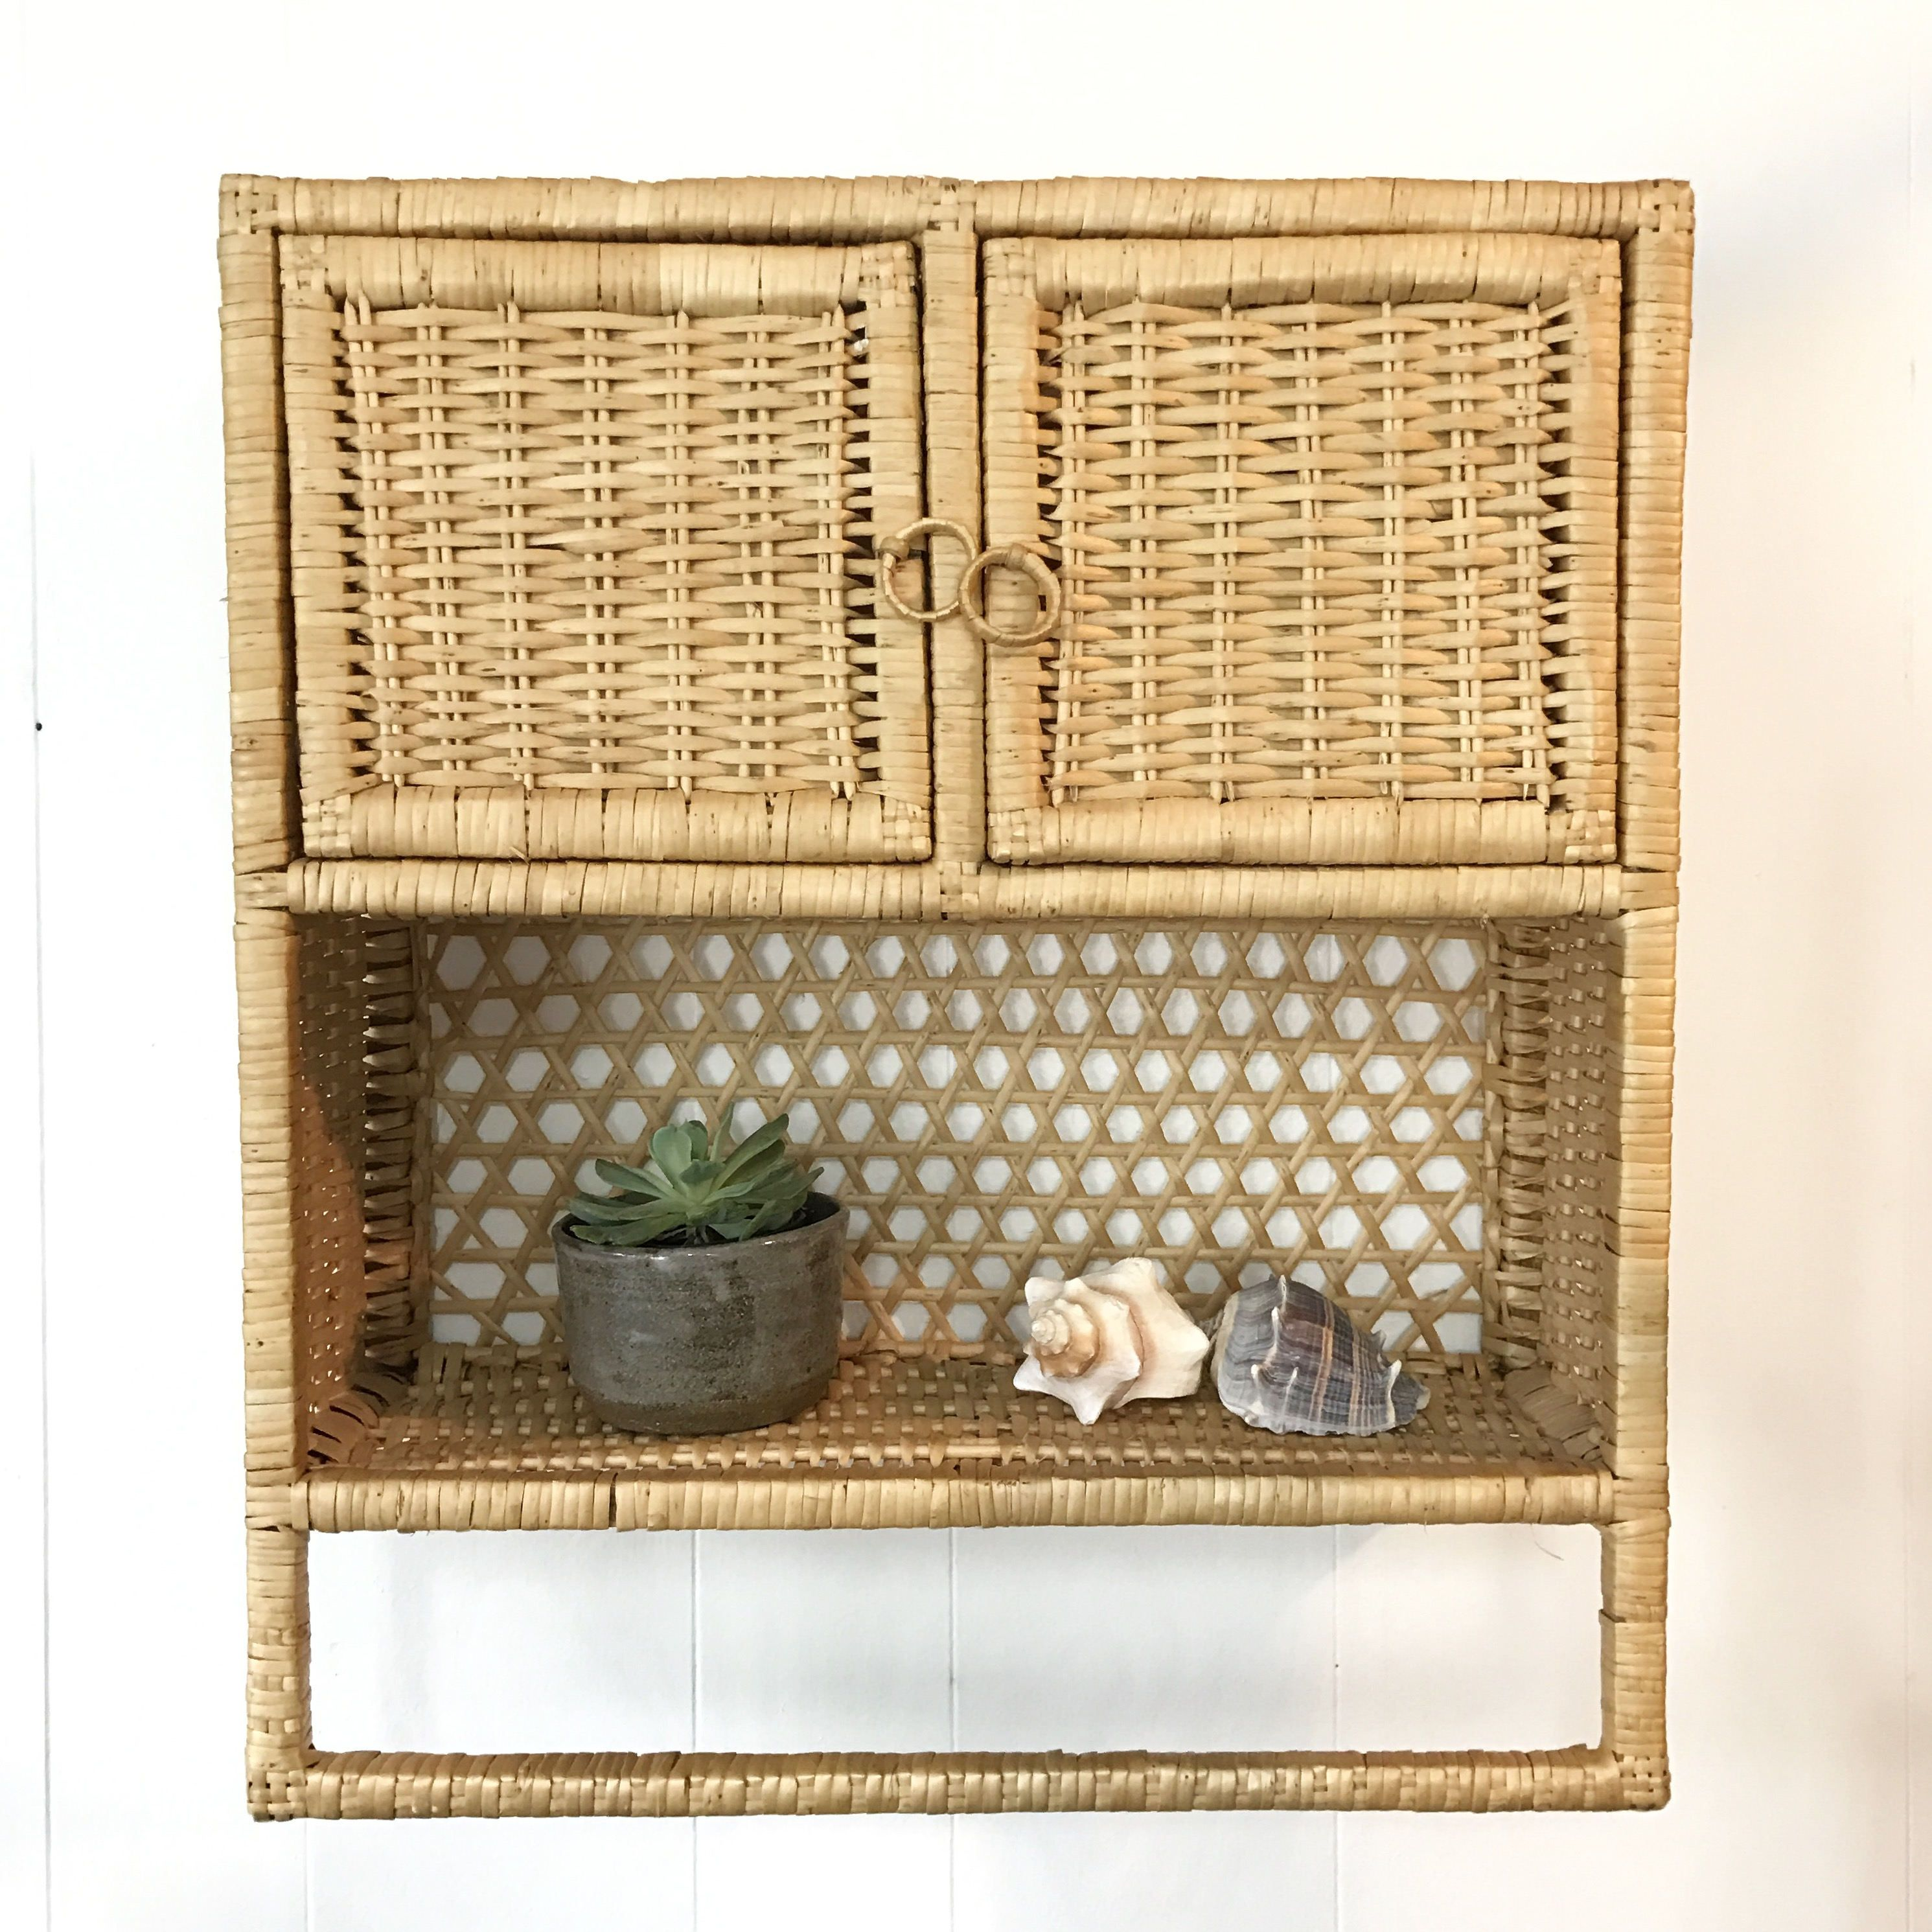 Vintage Rattan Cabinet Woven Wicker Wall Cupboard Bathroom Storage Shelf By Ninedoorsvintage O Kitchen Wall Shelves Wall Cupboards Bathroom Storage Shelves